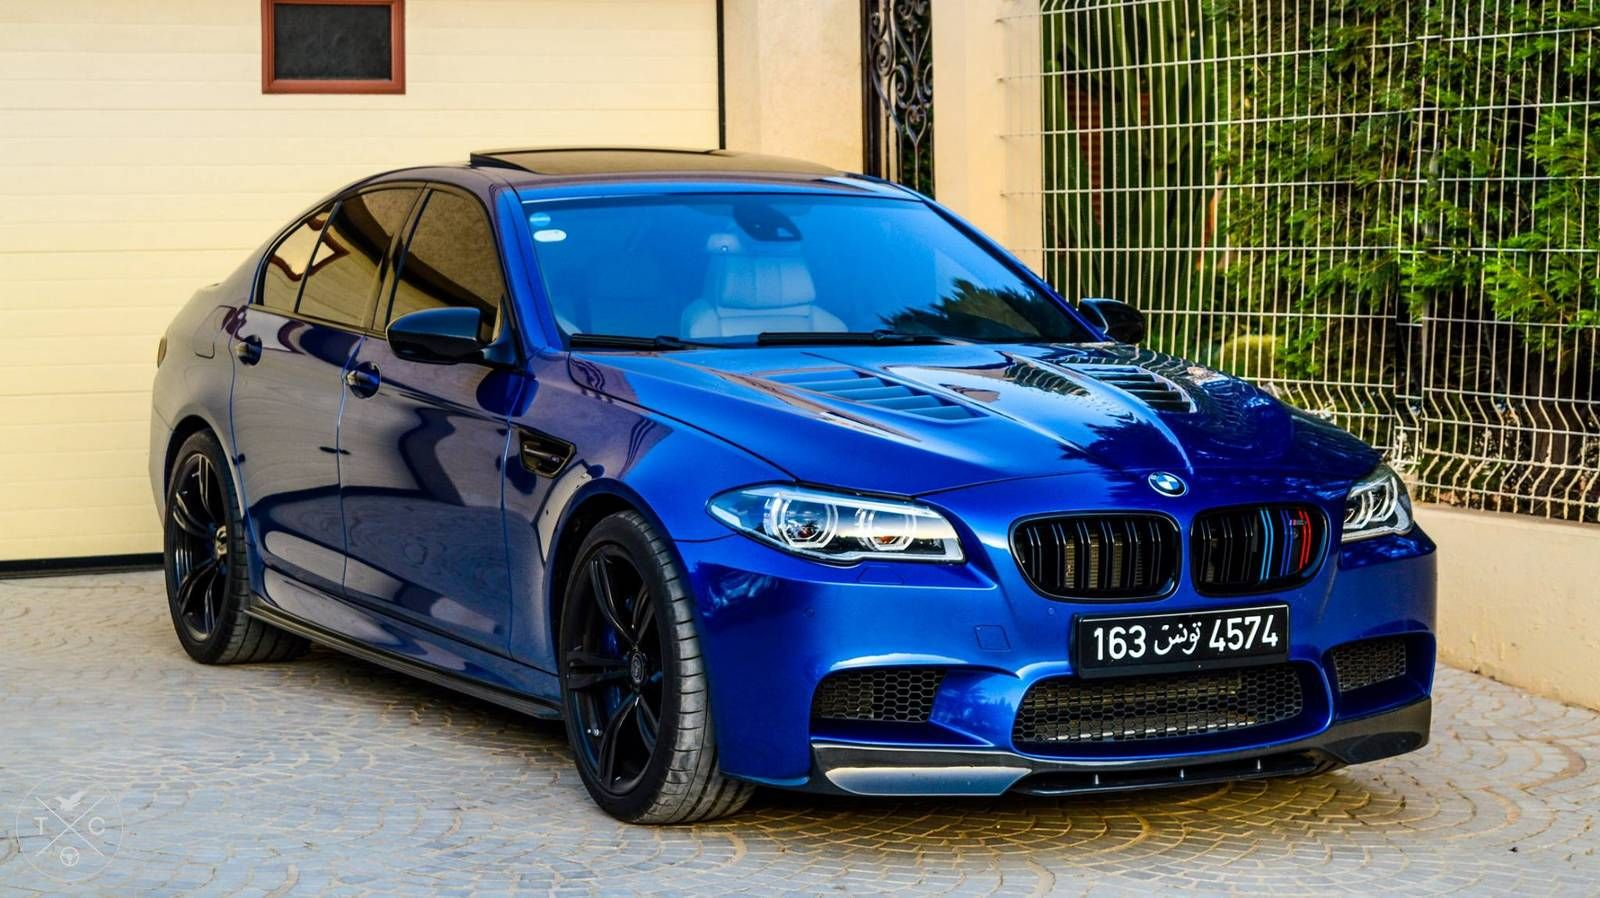 This Manhart BMW F10 M5 makes 740 horsepower - http://www.bmwblog.com/2016/06/13/manhart-bmw-f10-m5-makes-740-horsepower/